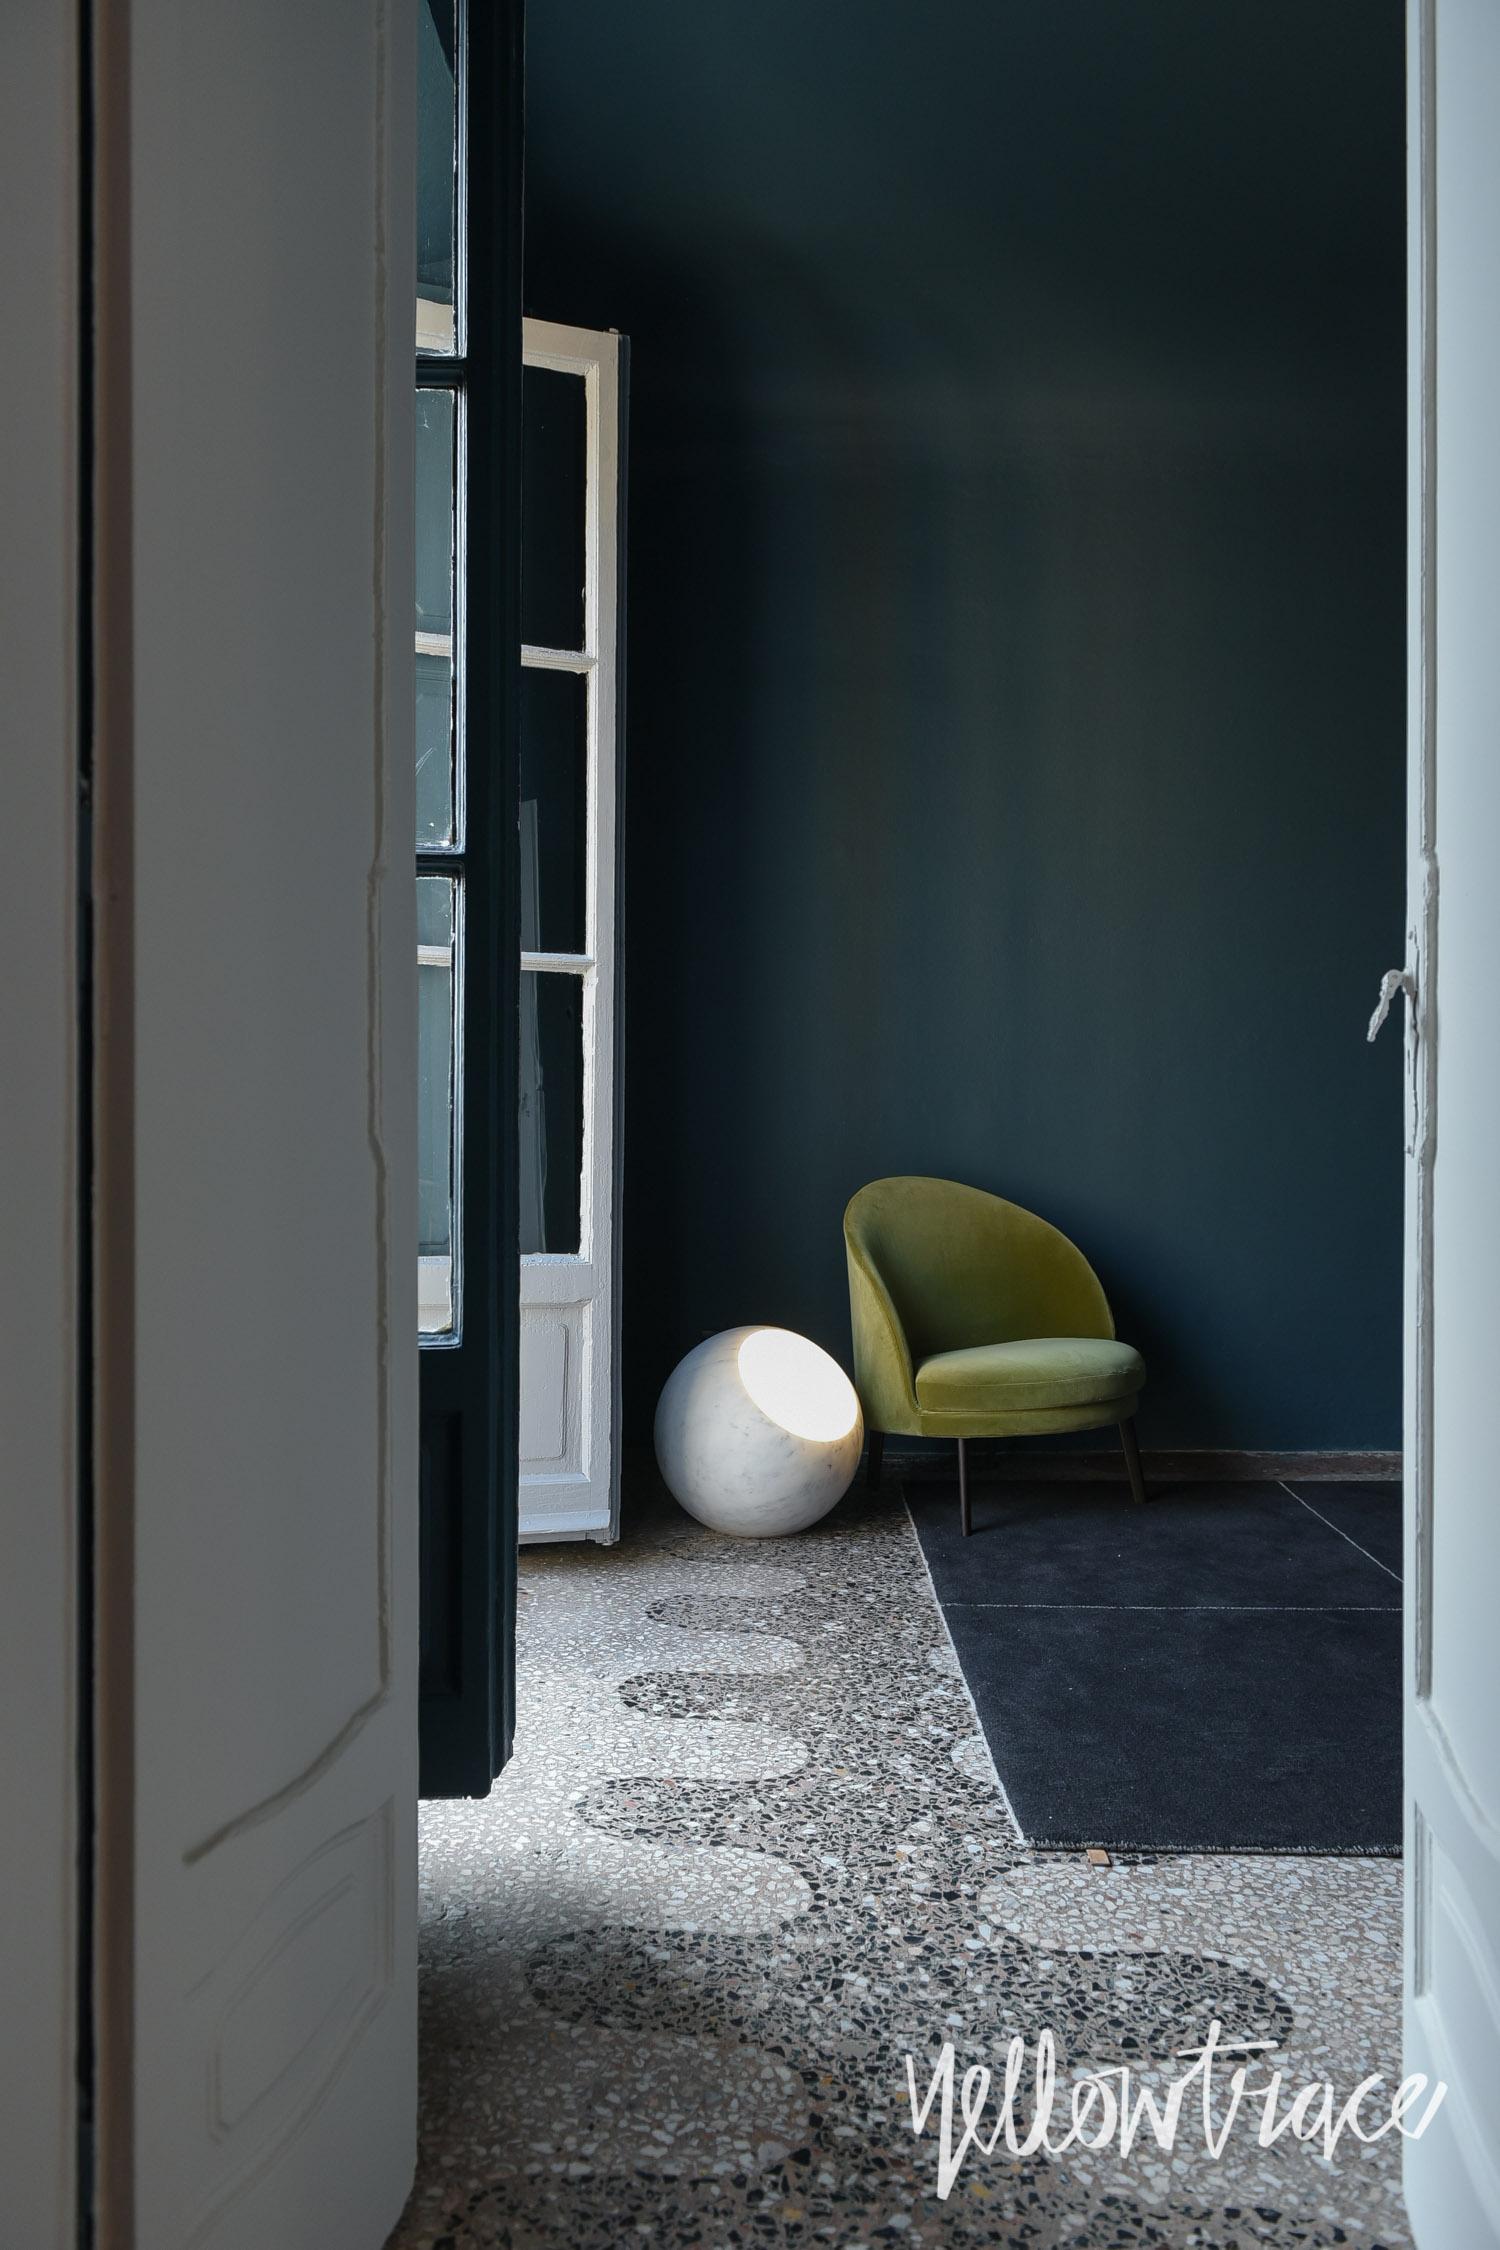 Milan Design Week 2017 Highlights, Salvatori Apartment in Brera by Elisa Ossino Studio, Photo © Nick Hughes | #Milantrace2017